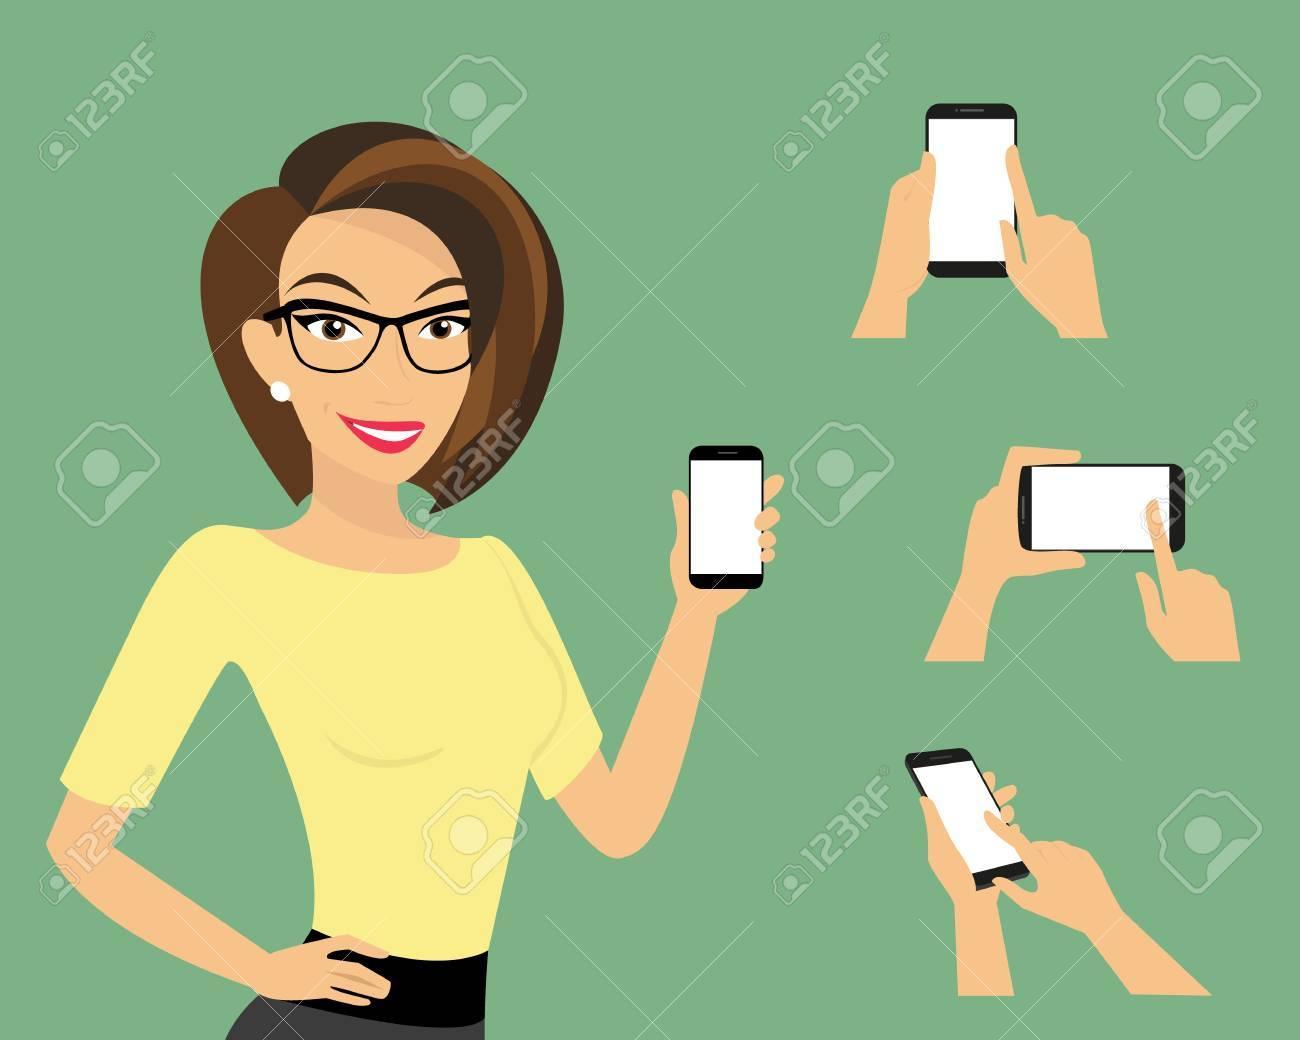 free sample smartphones